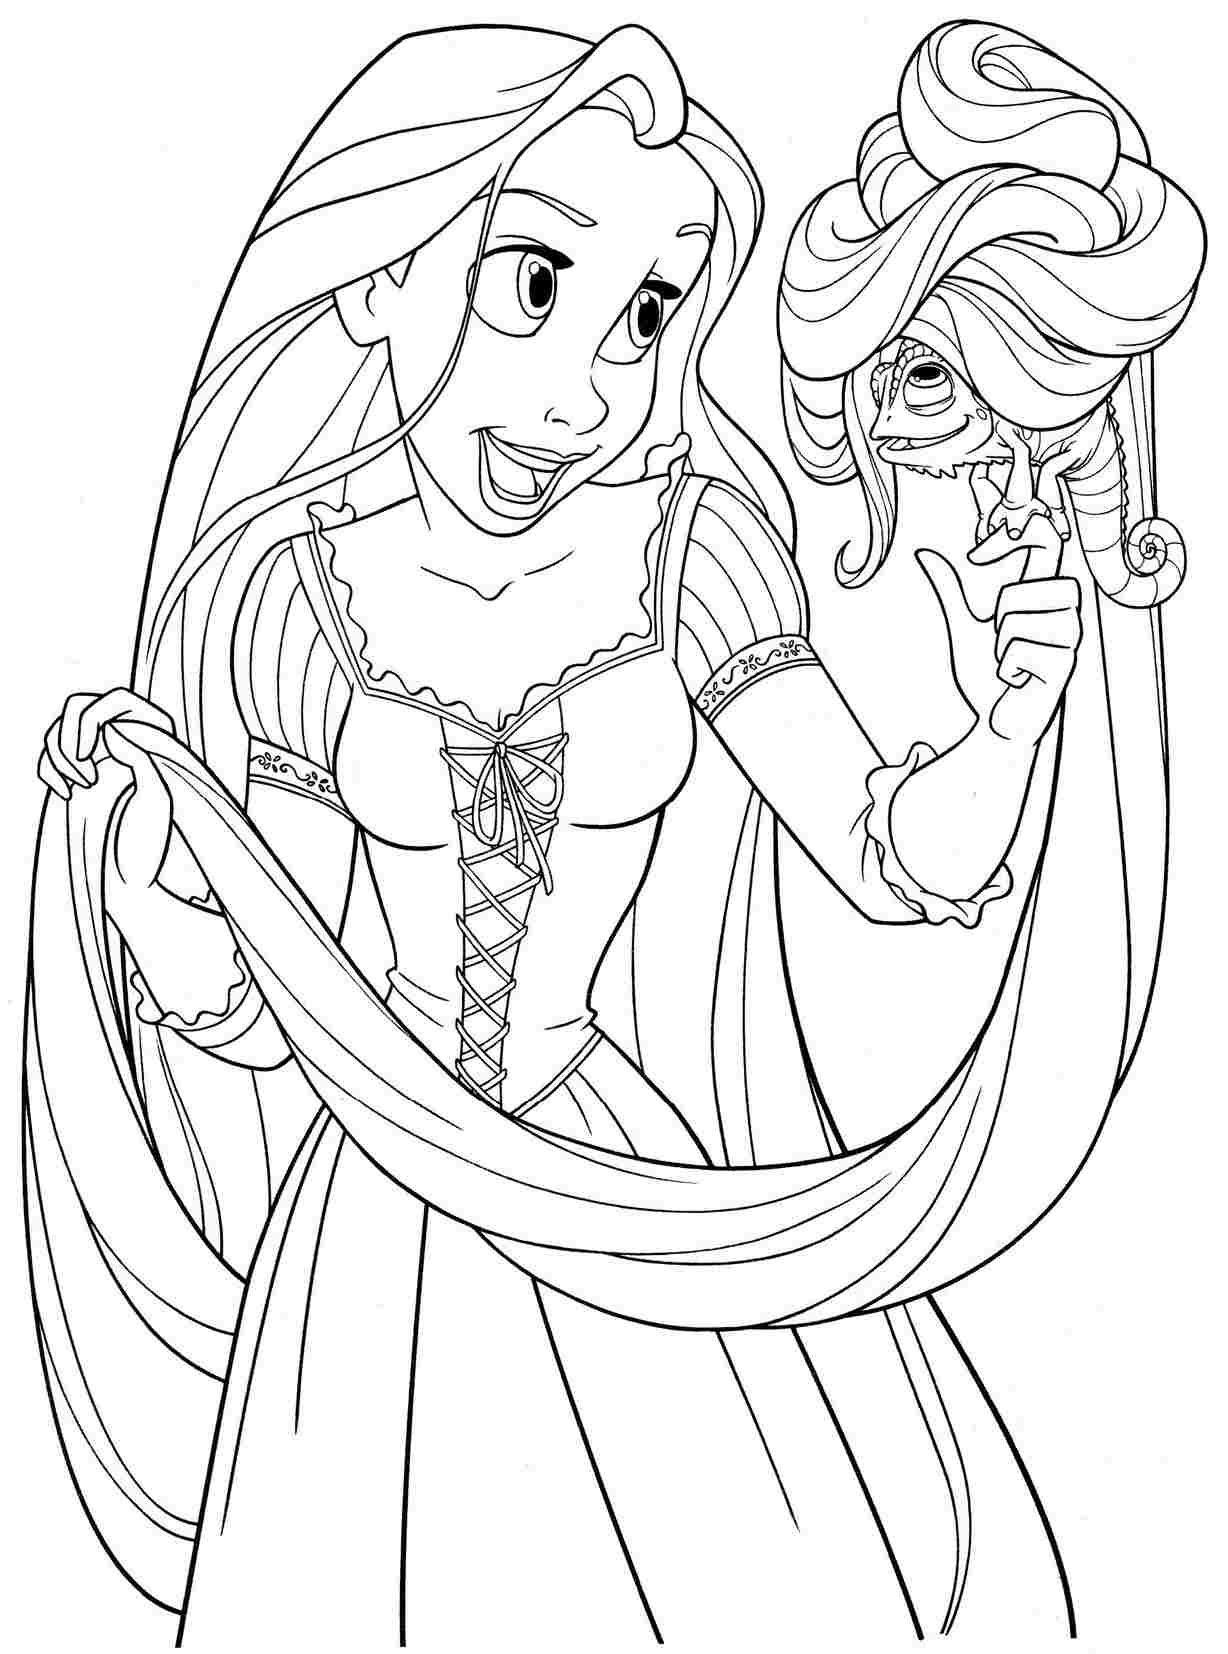 Printable free colouring pages disney princess rapunzel, disney princess coloring pages